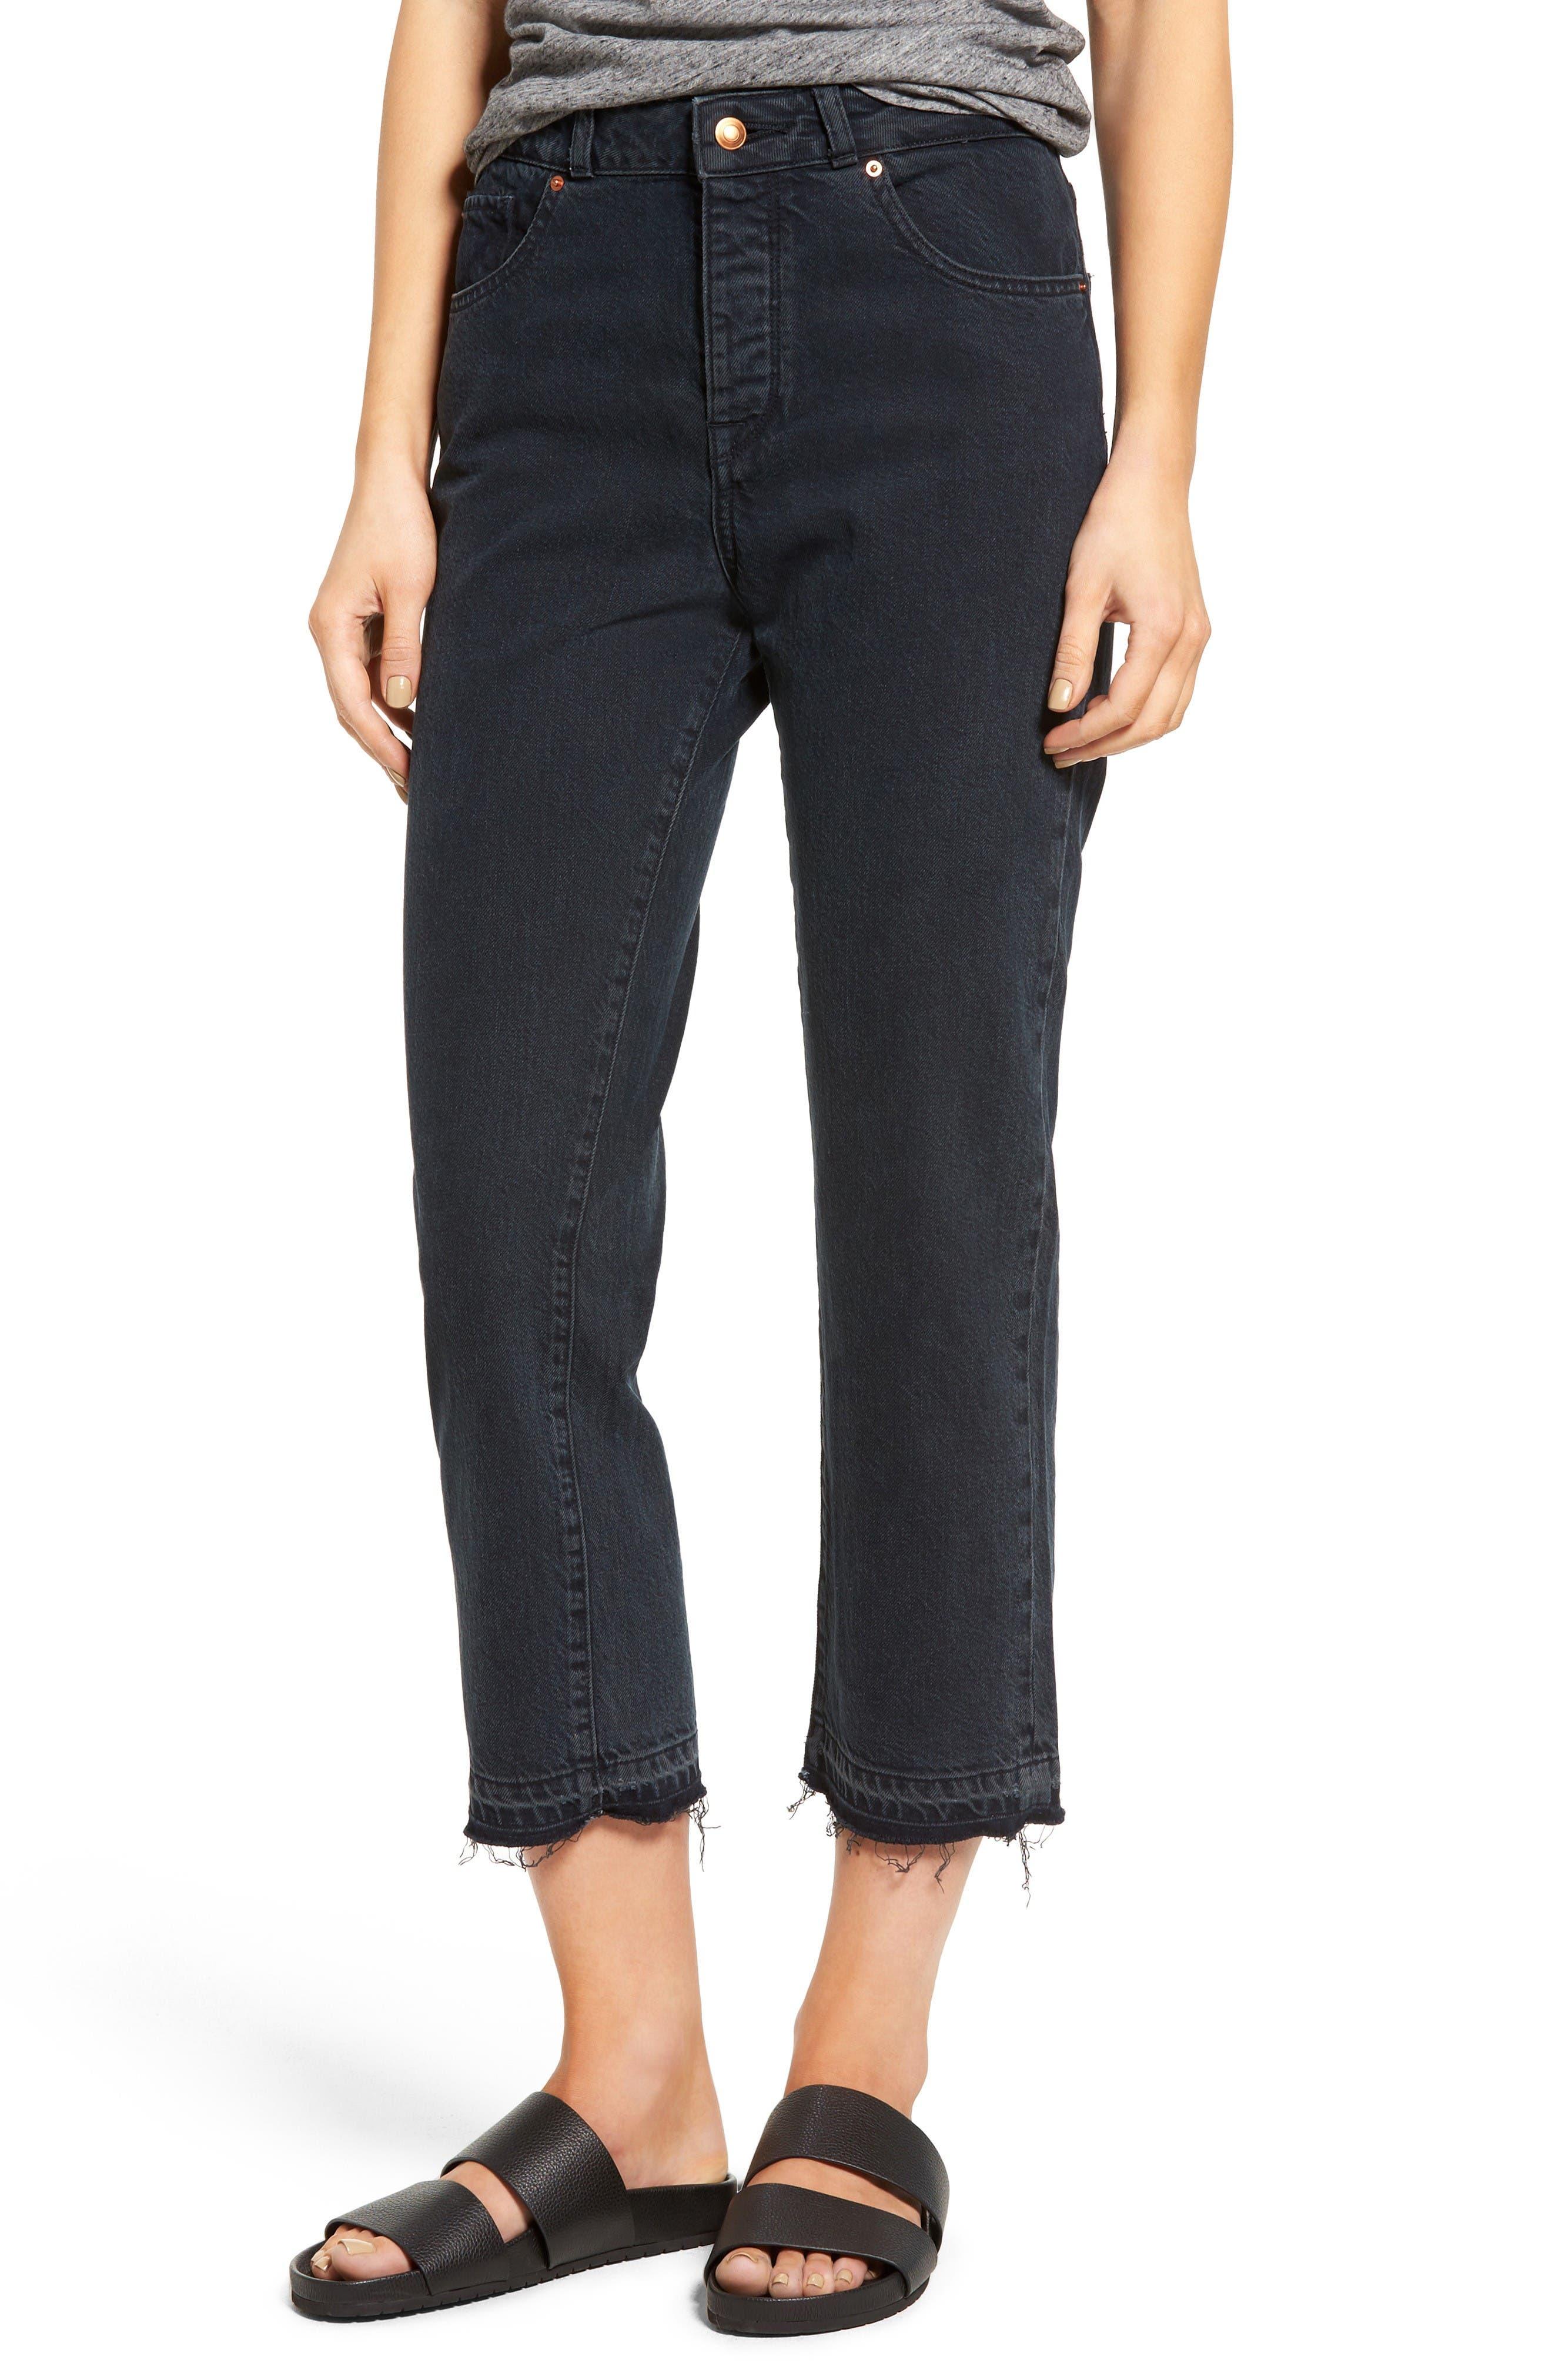 DL1961 Patti High Rise Straight Leg Jeans